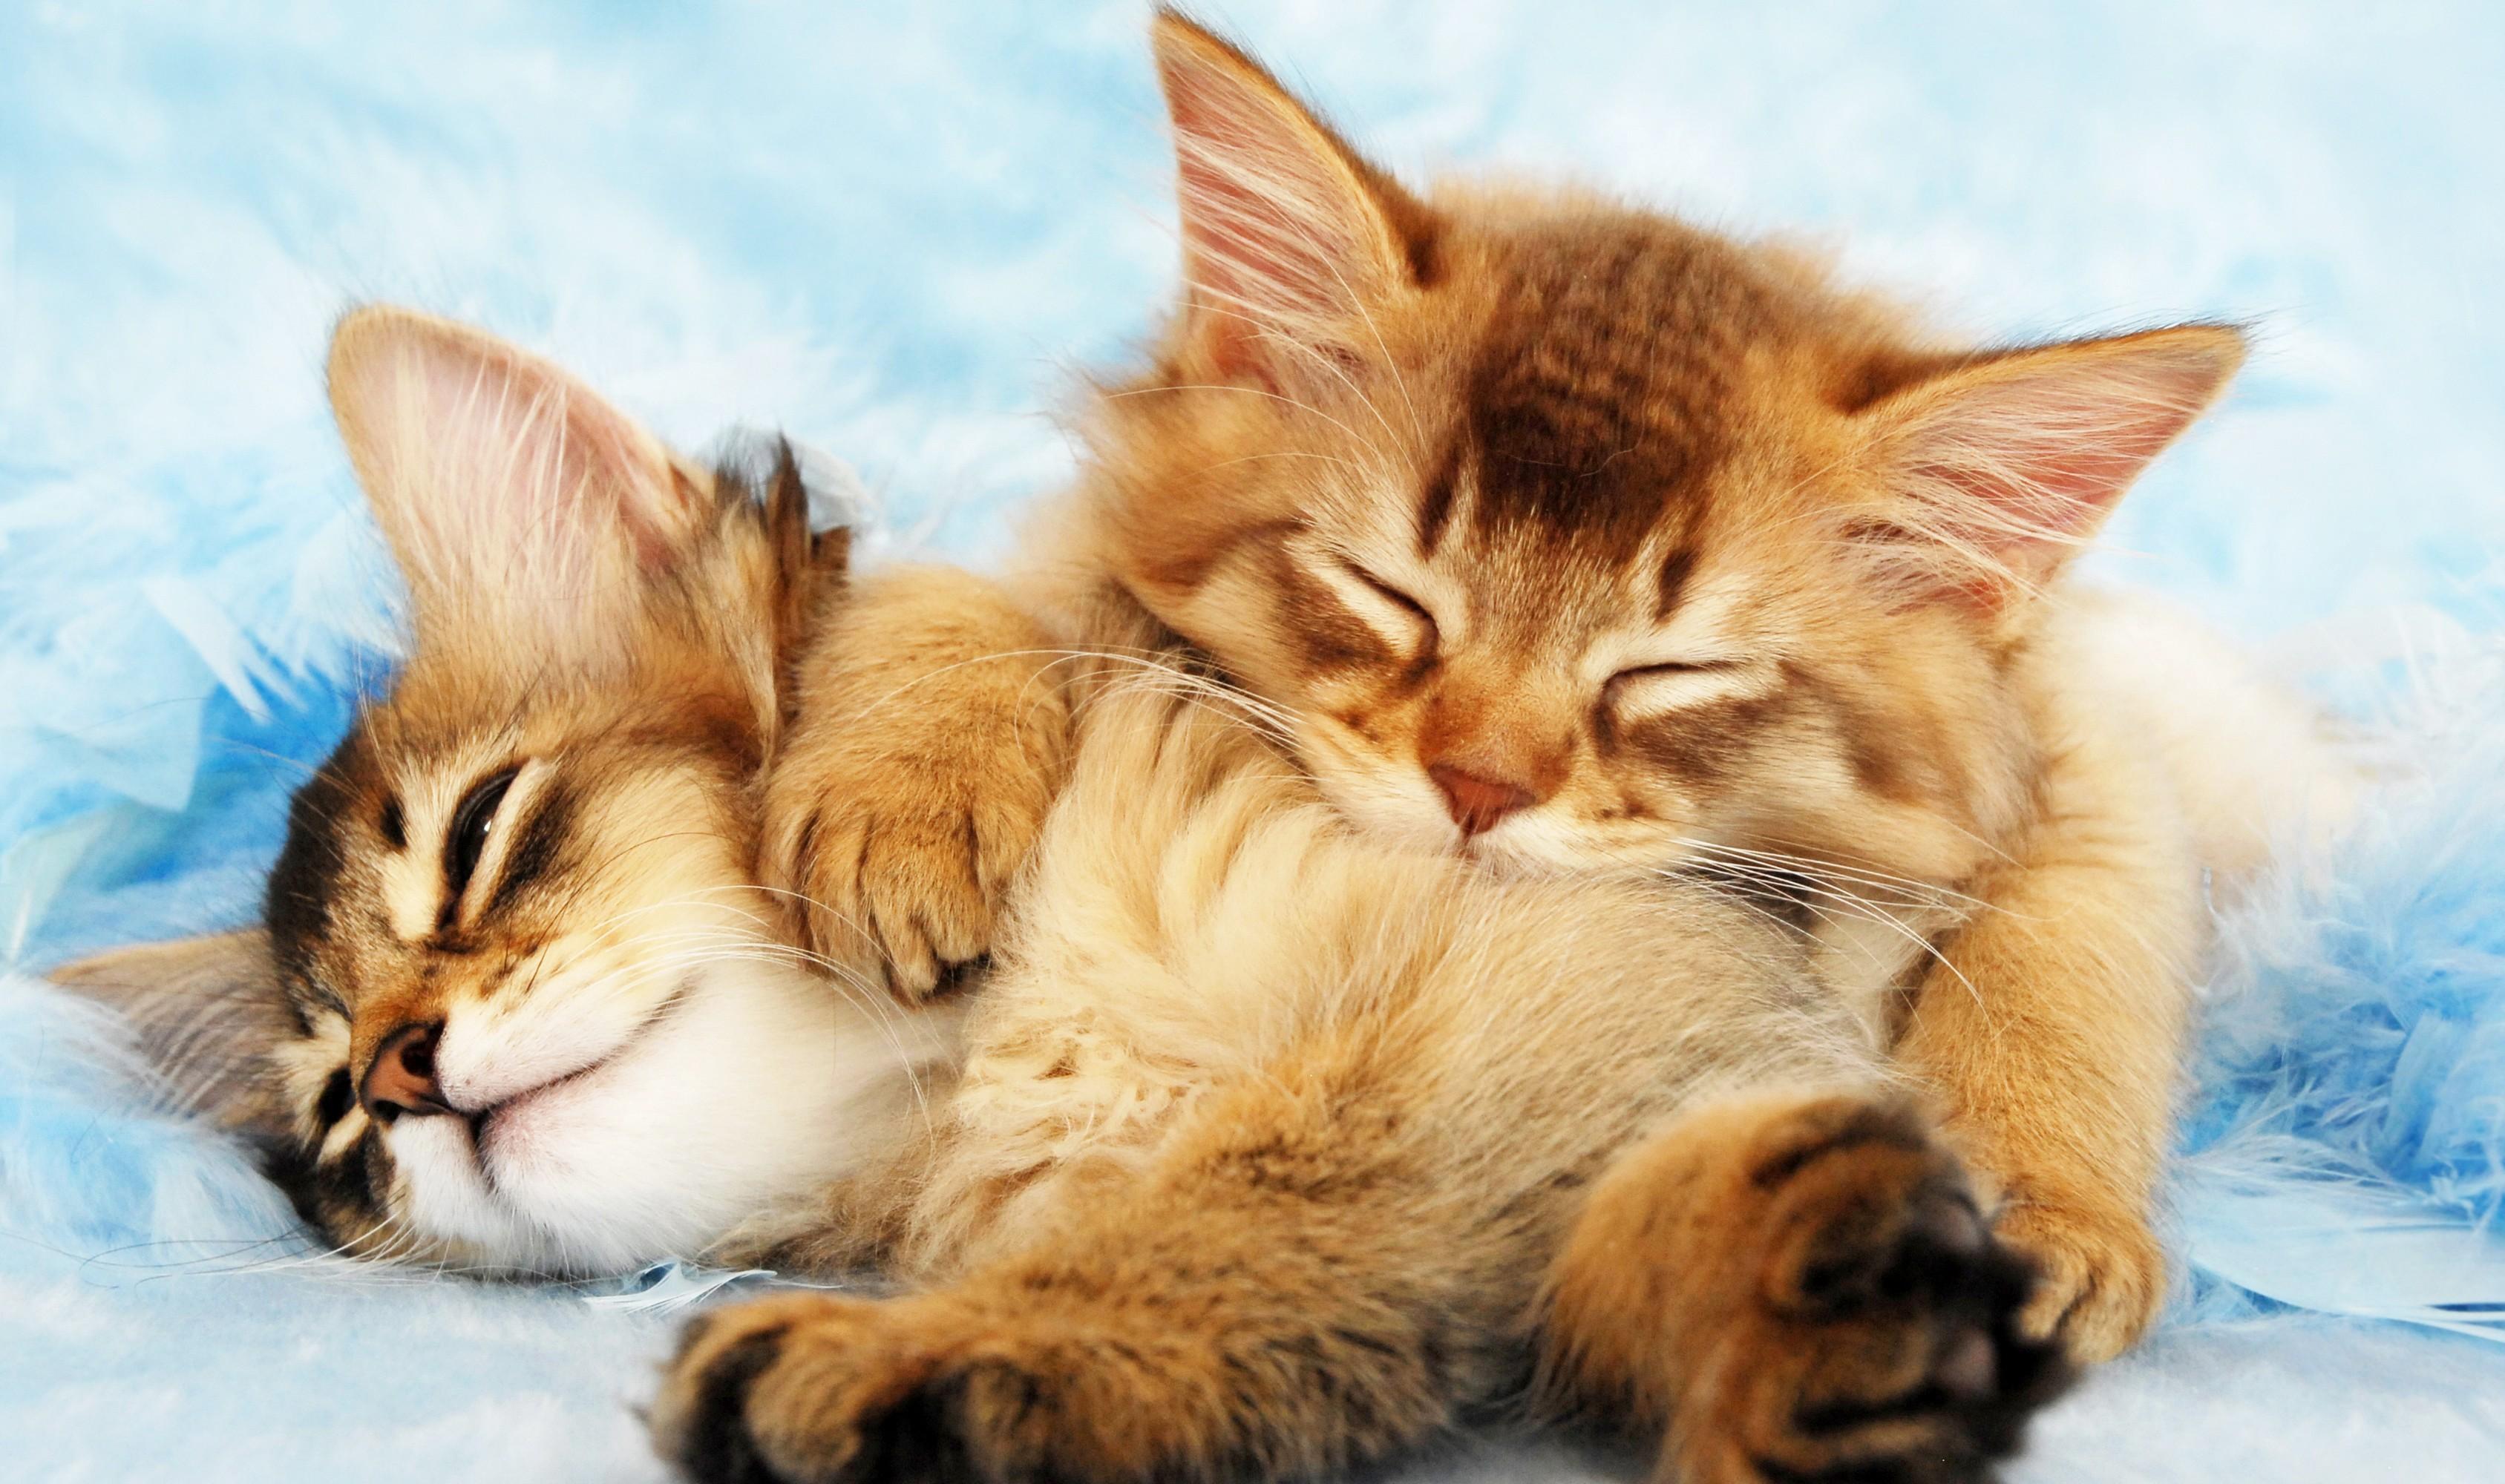 General 3375x2000 kittens cats animals sleeping